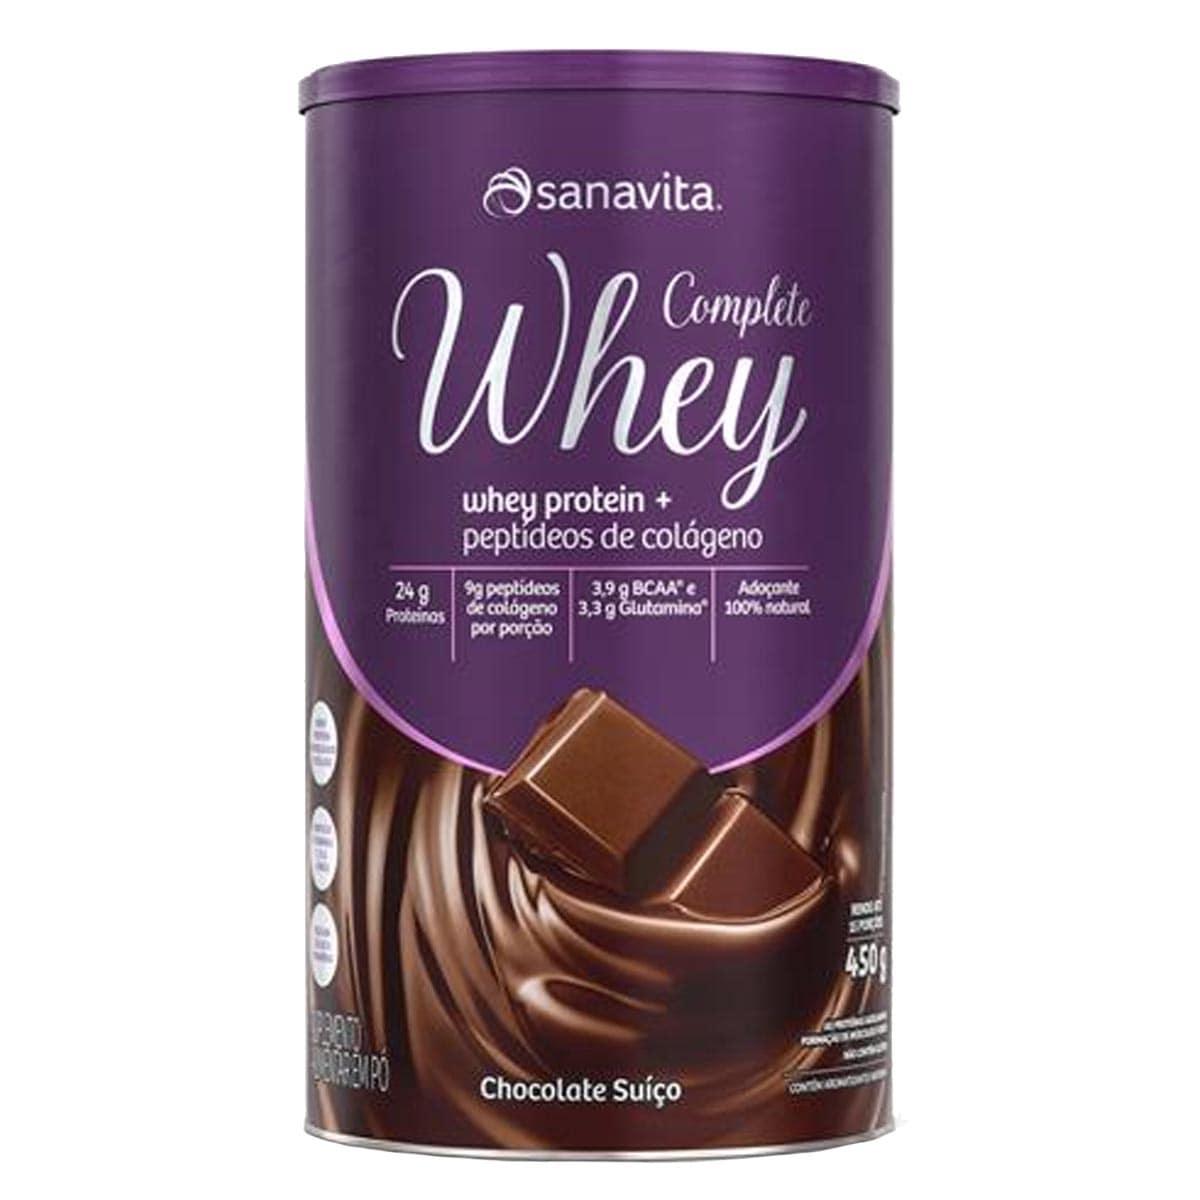 Complete Whey Chocolate Suiço lata 450g